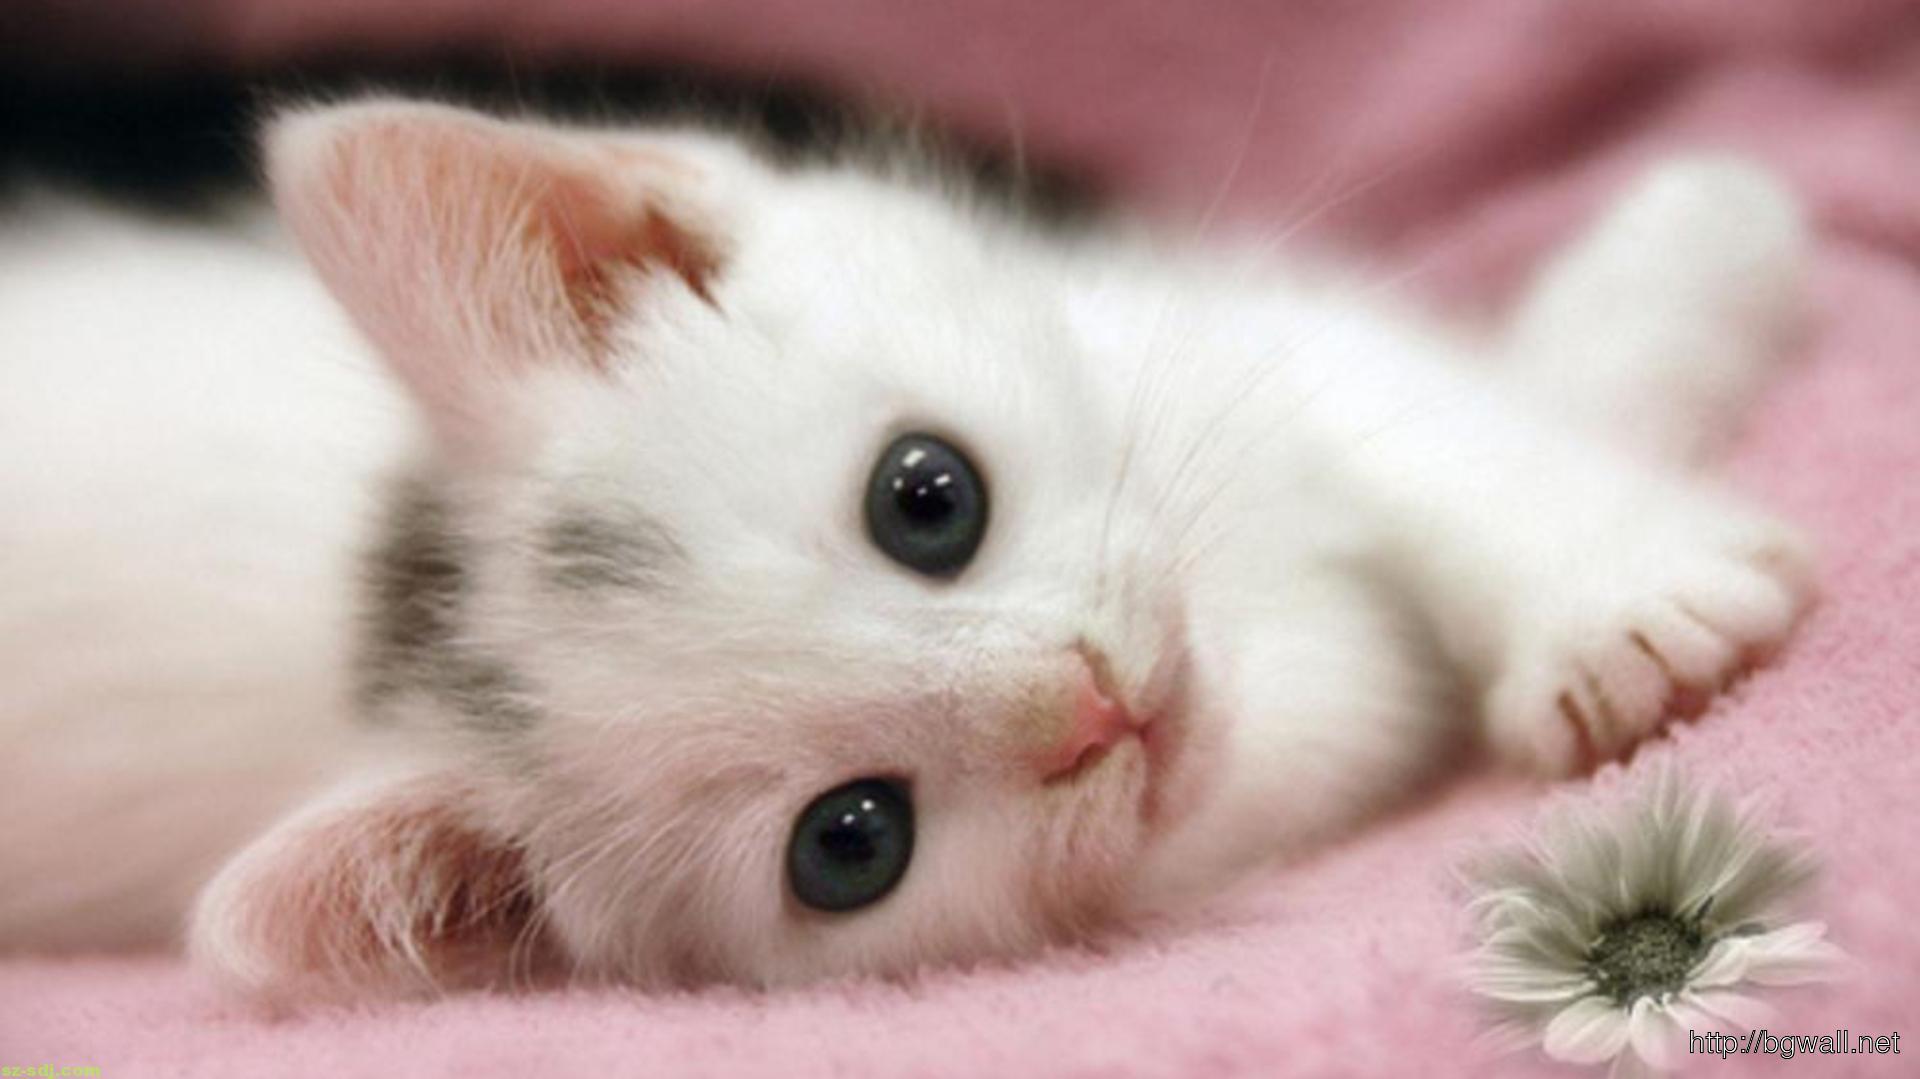 Cute Baby Kittens Wallpaper cute baby cat wallpaper